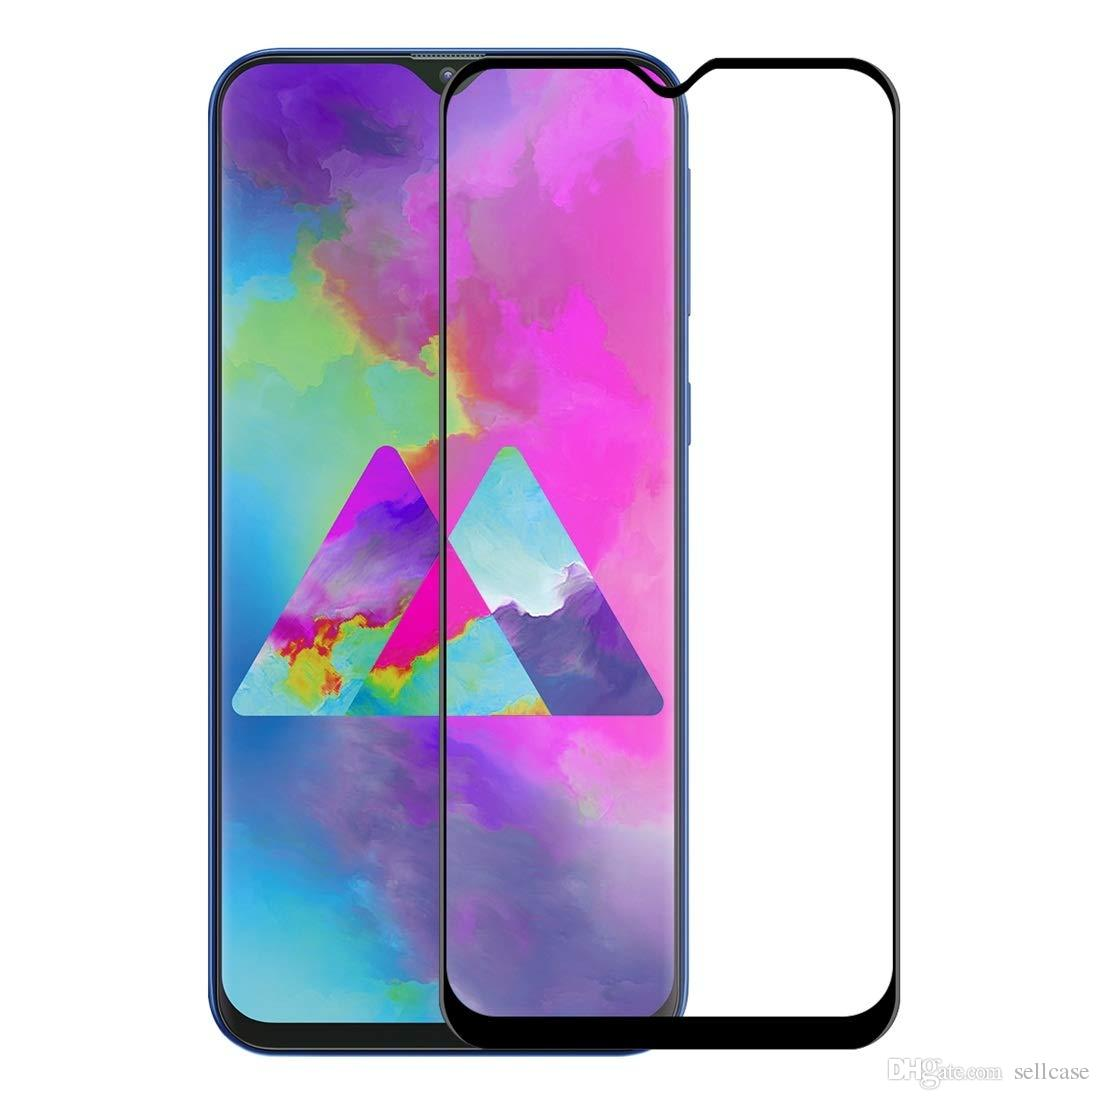 Escudo de vidrio templado Cobertura Total Protection Film Protector de pantalla para Samsung Galaxy M10 M20 M30 M51 M30S A40 A41 A31 A10 M31 A70S A20S